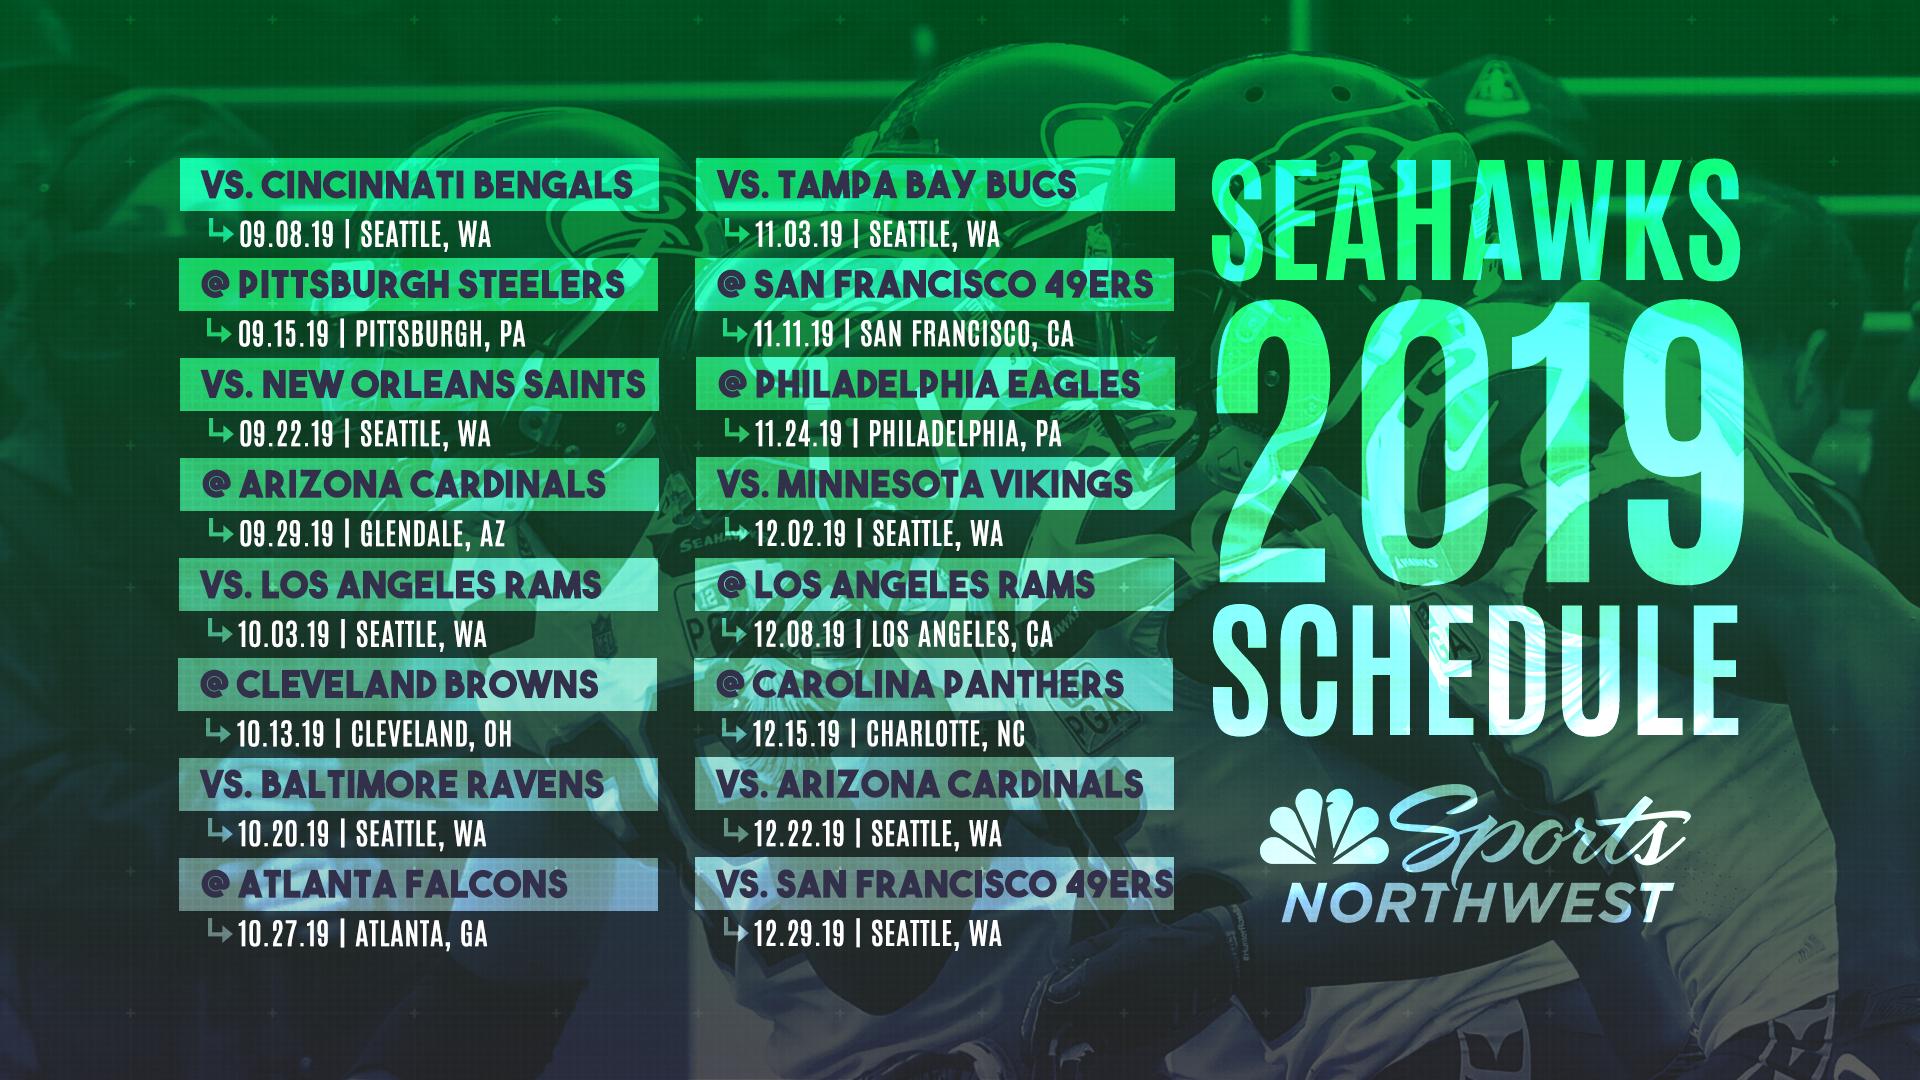 The 2019 Seattle Seahawks Regular Season Schedule Is Here